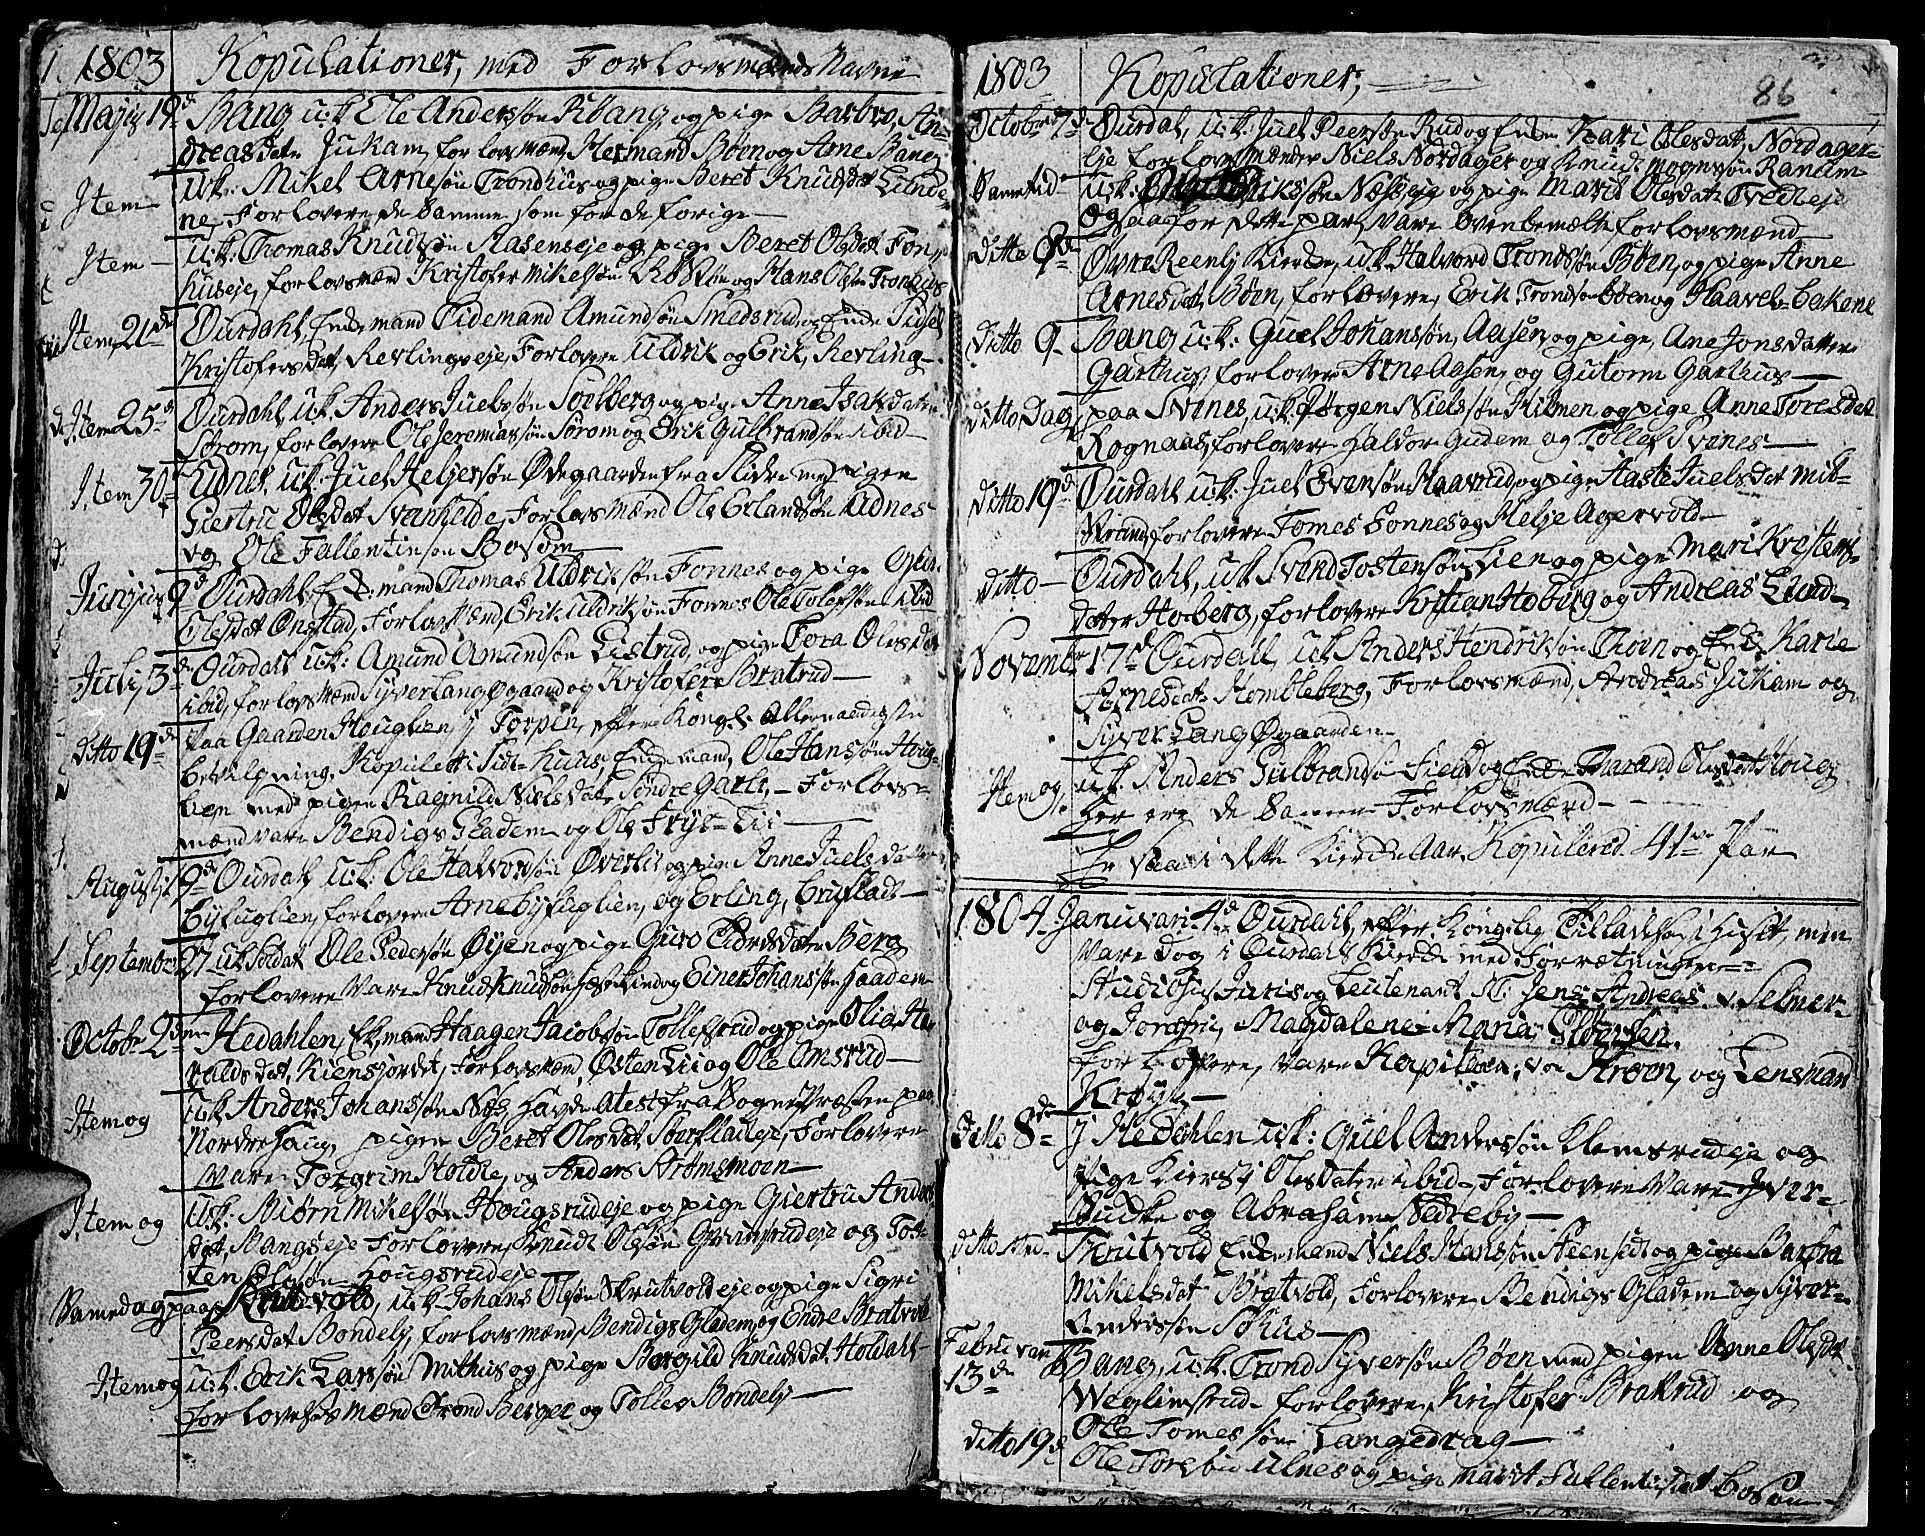 SAH, Aurdal prestekontor, Ministerialbok nr. 7, 1800-1808, s. 86